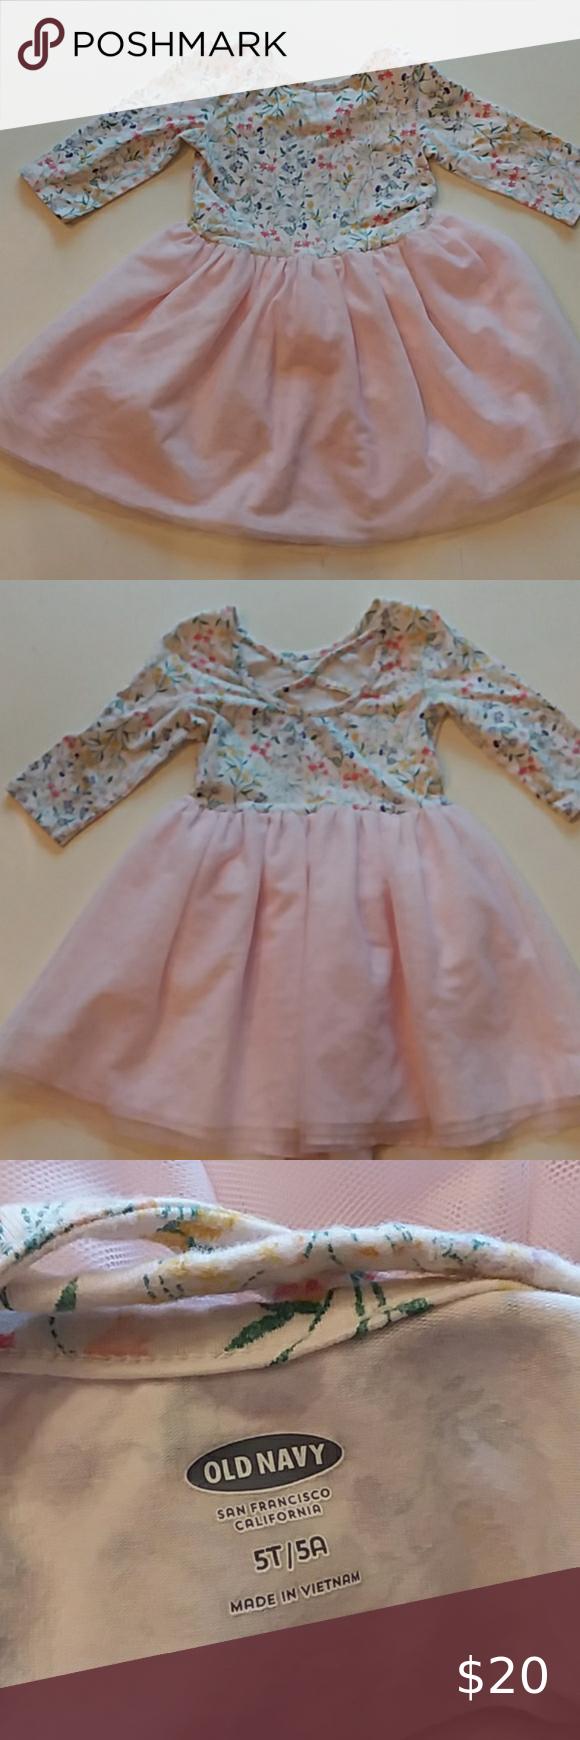 Old Navy 5t Floral Print Ballerina Tulle Dress Tulle Dress Long Sleeve Tulle Dress Dresses [ 1740 x 580 Pixel ]